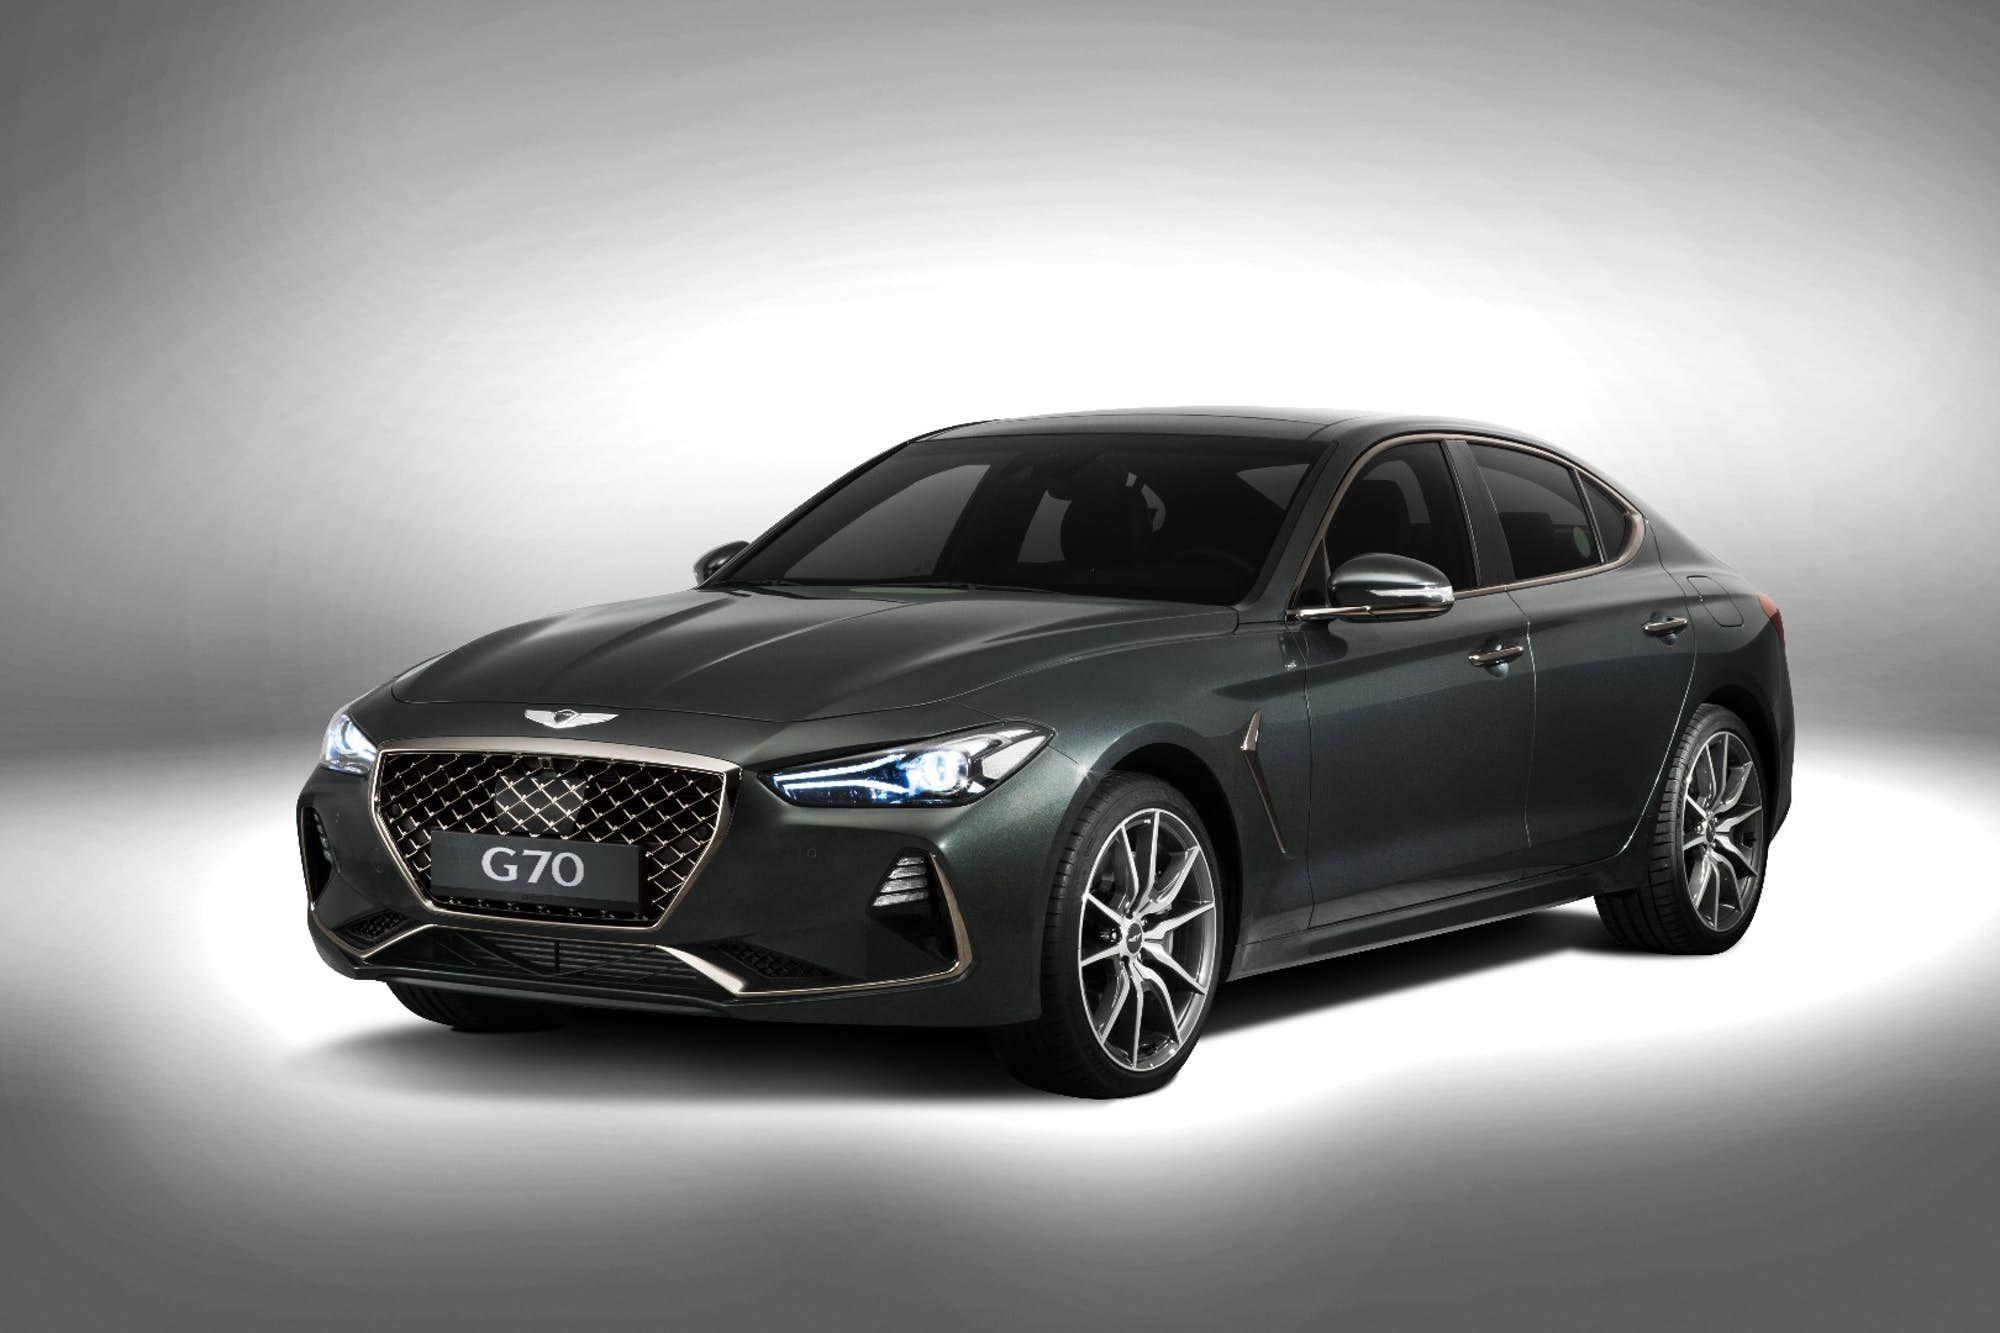 Hyundai Puts Luxury Spin On The Stinger With Genesis G70 Hyundai Genesis Hyundai Genesis Coupe Luxury Sedan